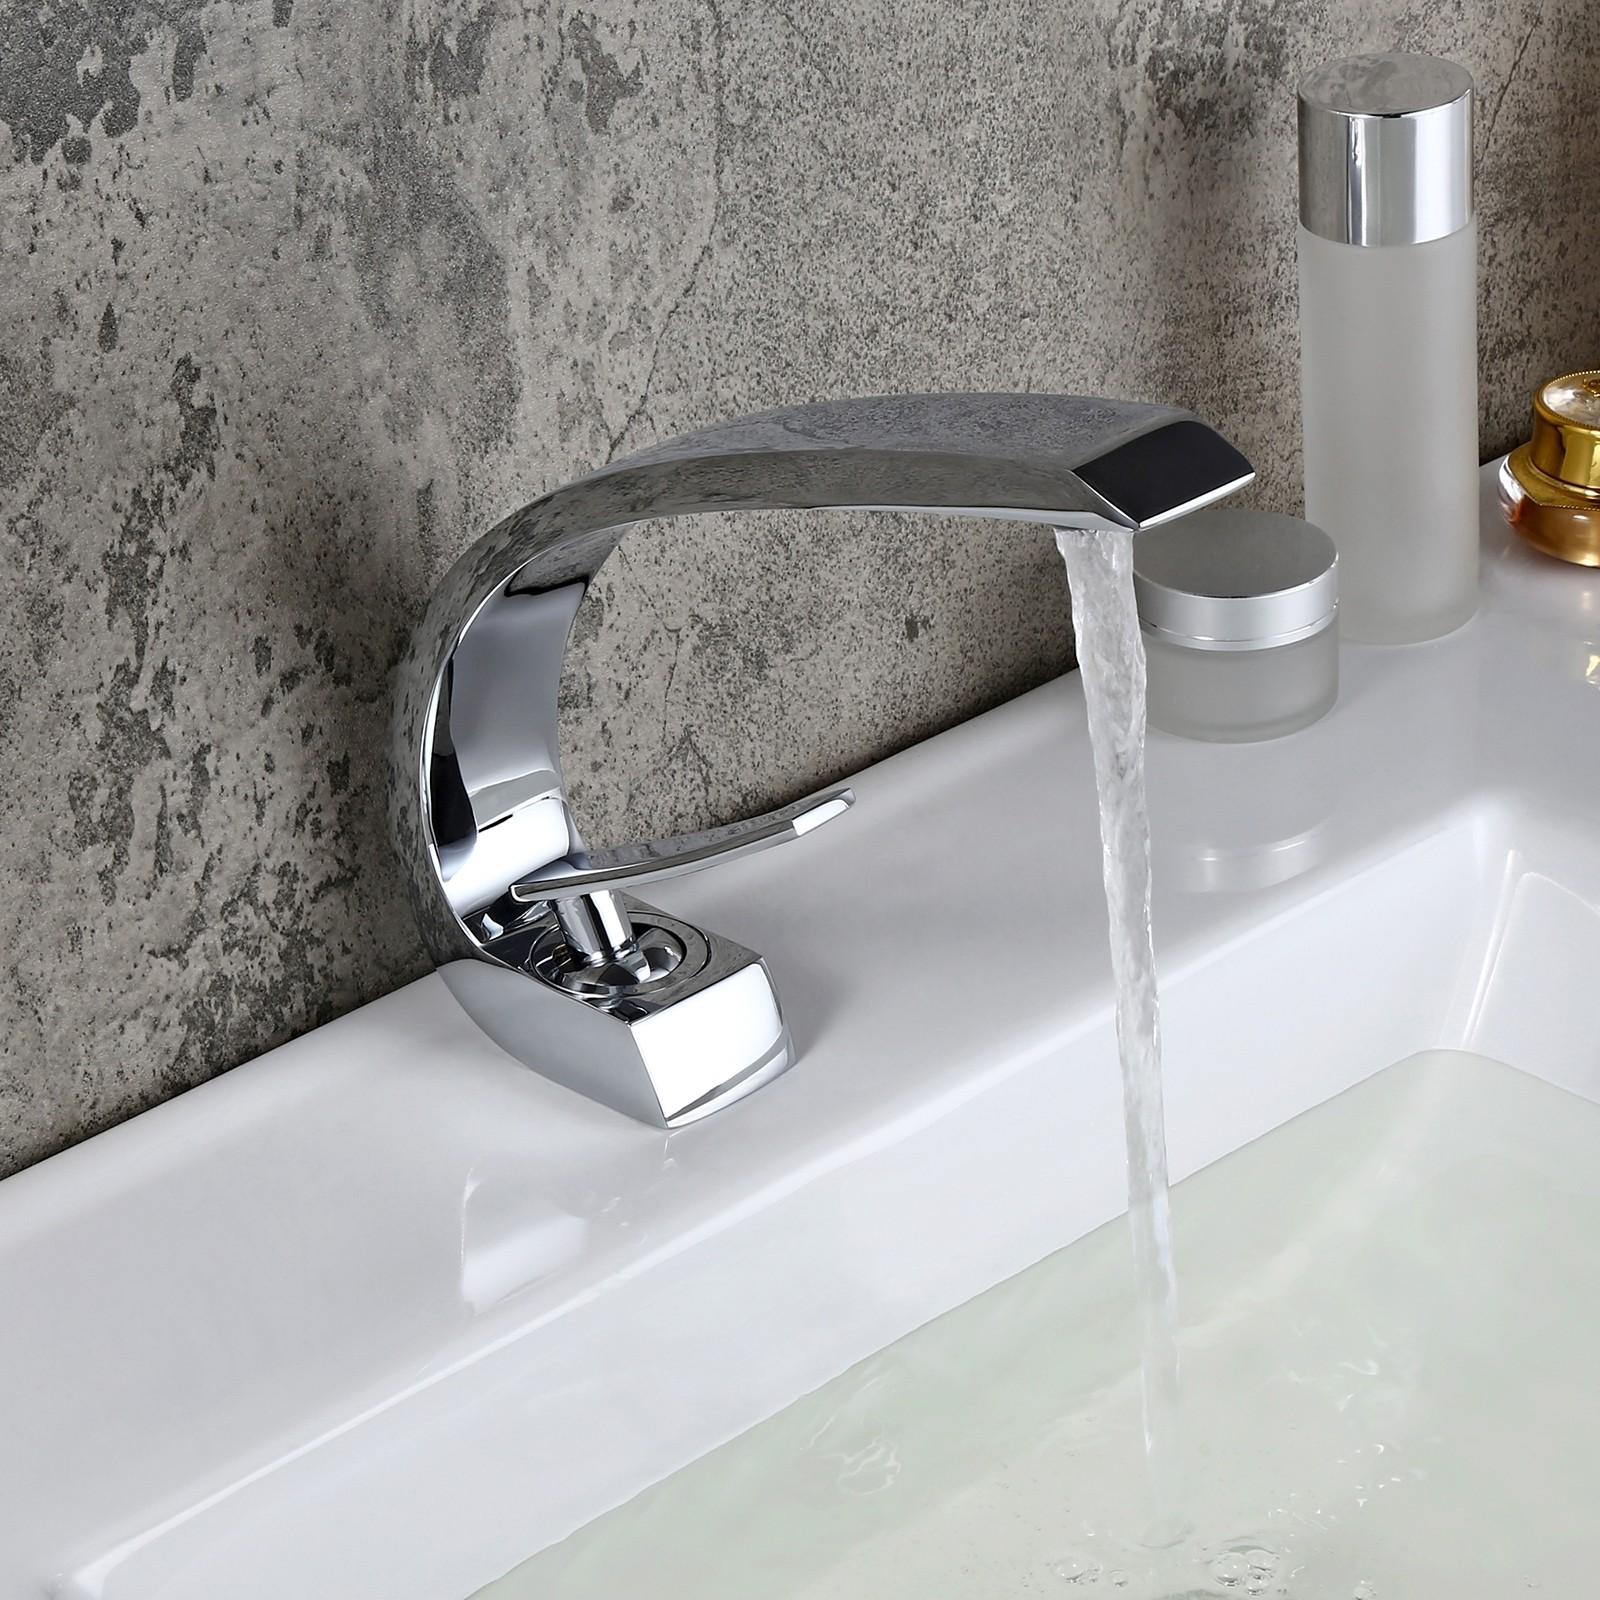 Elegant Bathroom Faucet Modern Curved